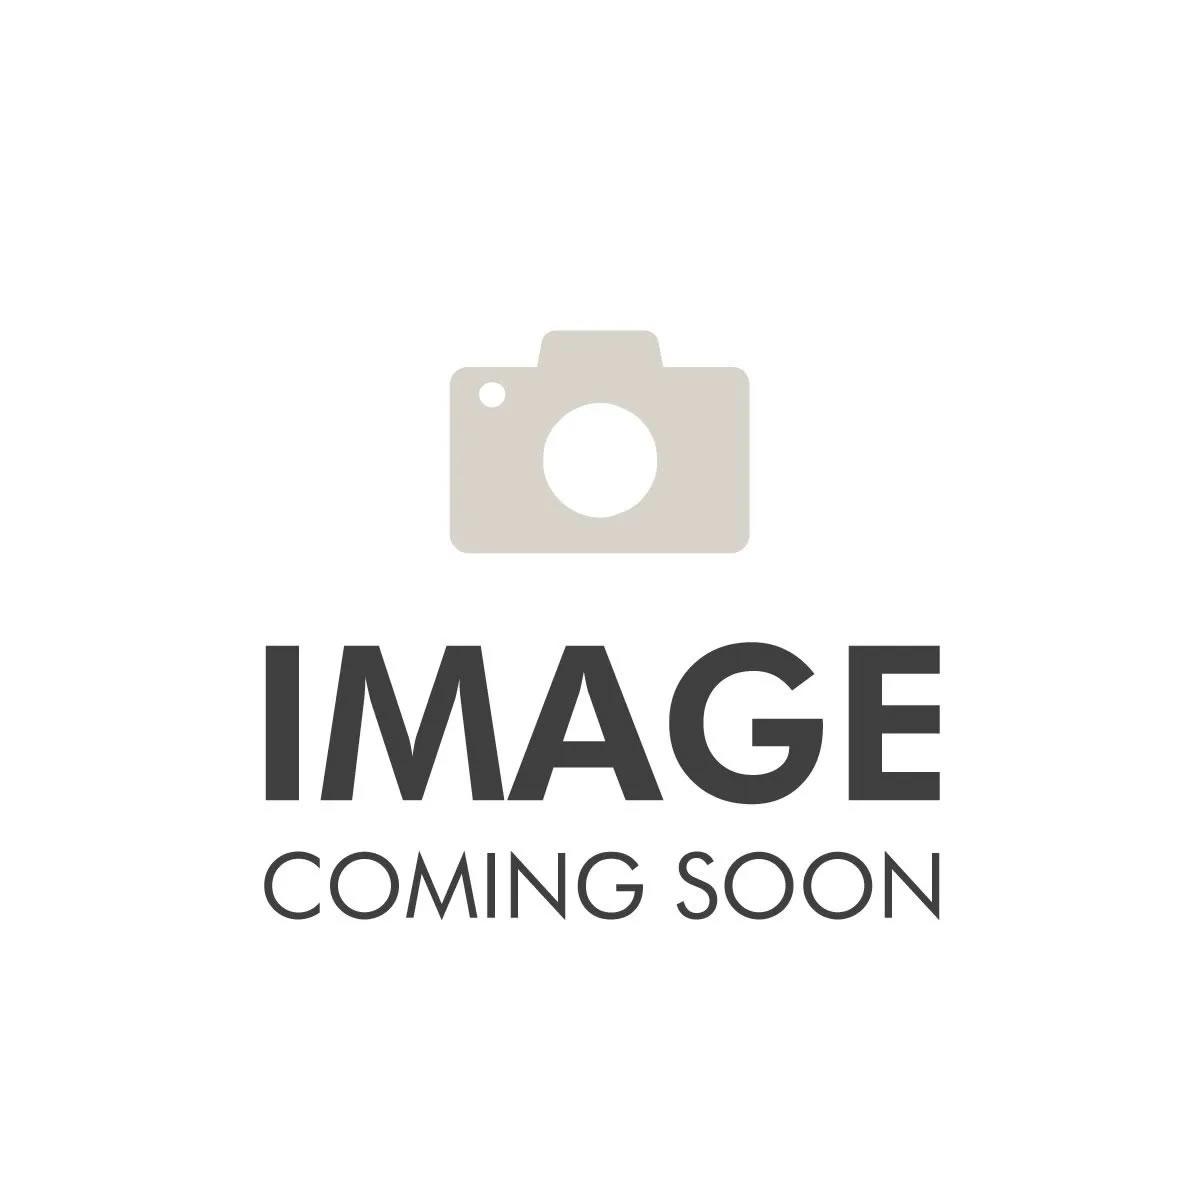 Glove Box And Trail Dash Net Kit 97-06 Jeep TJ/LJ Wrangler